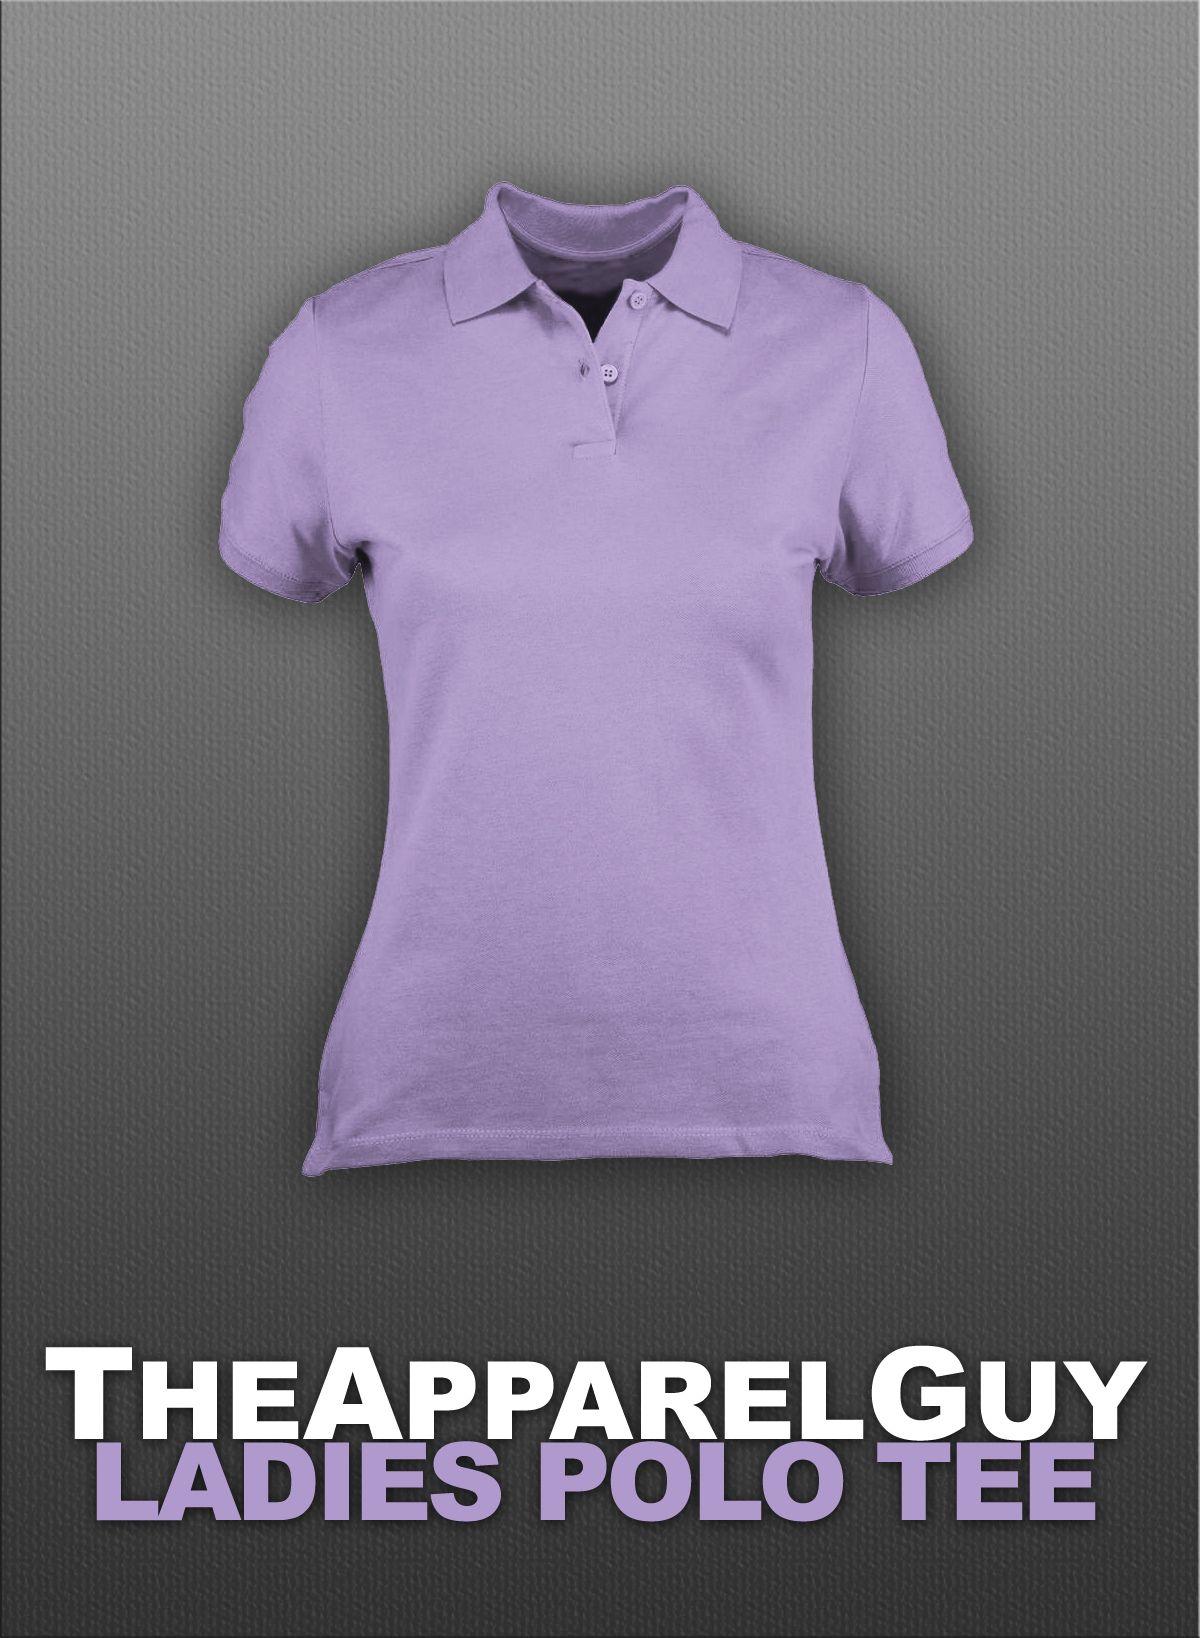 Download Ladies Polo Tee Psd By Theapparelguy On Deviantart Polo Shirt Women Polo Tees Polo